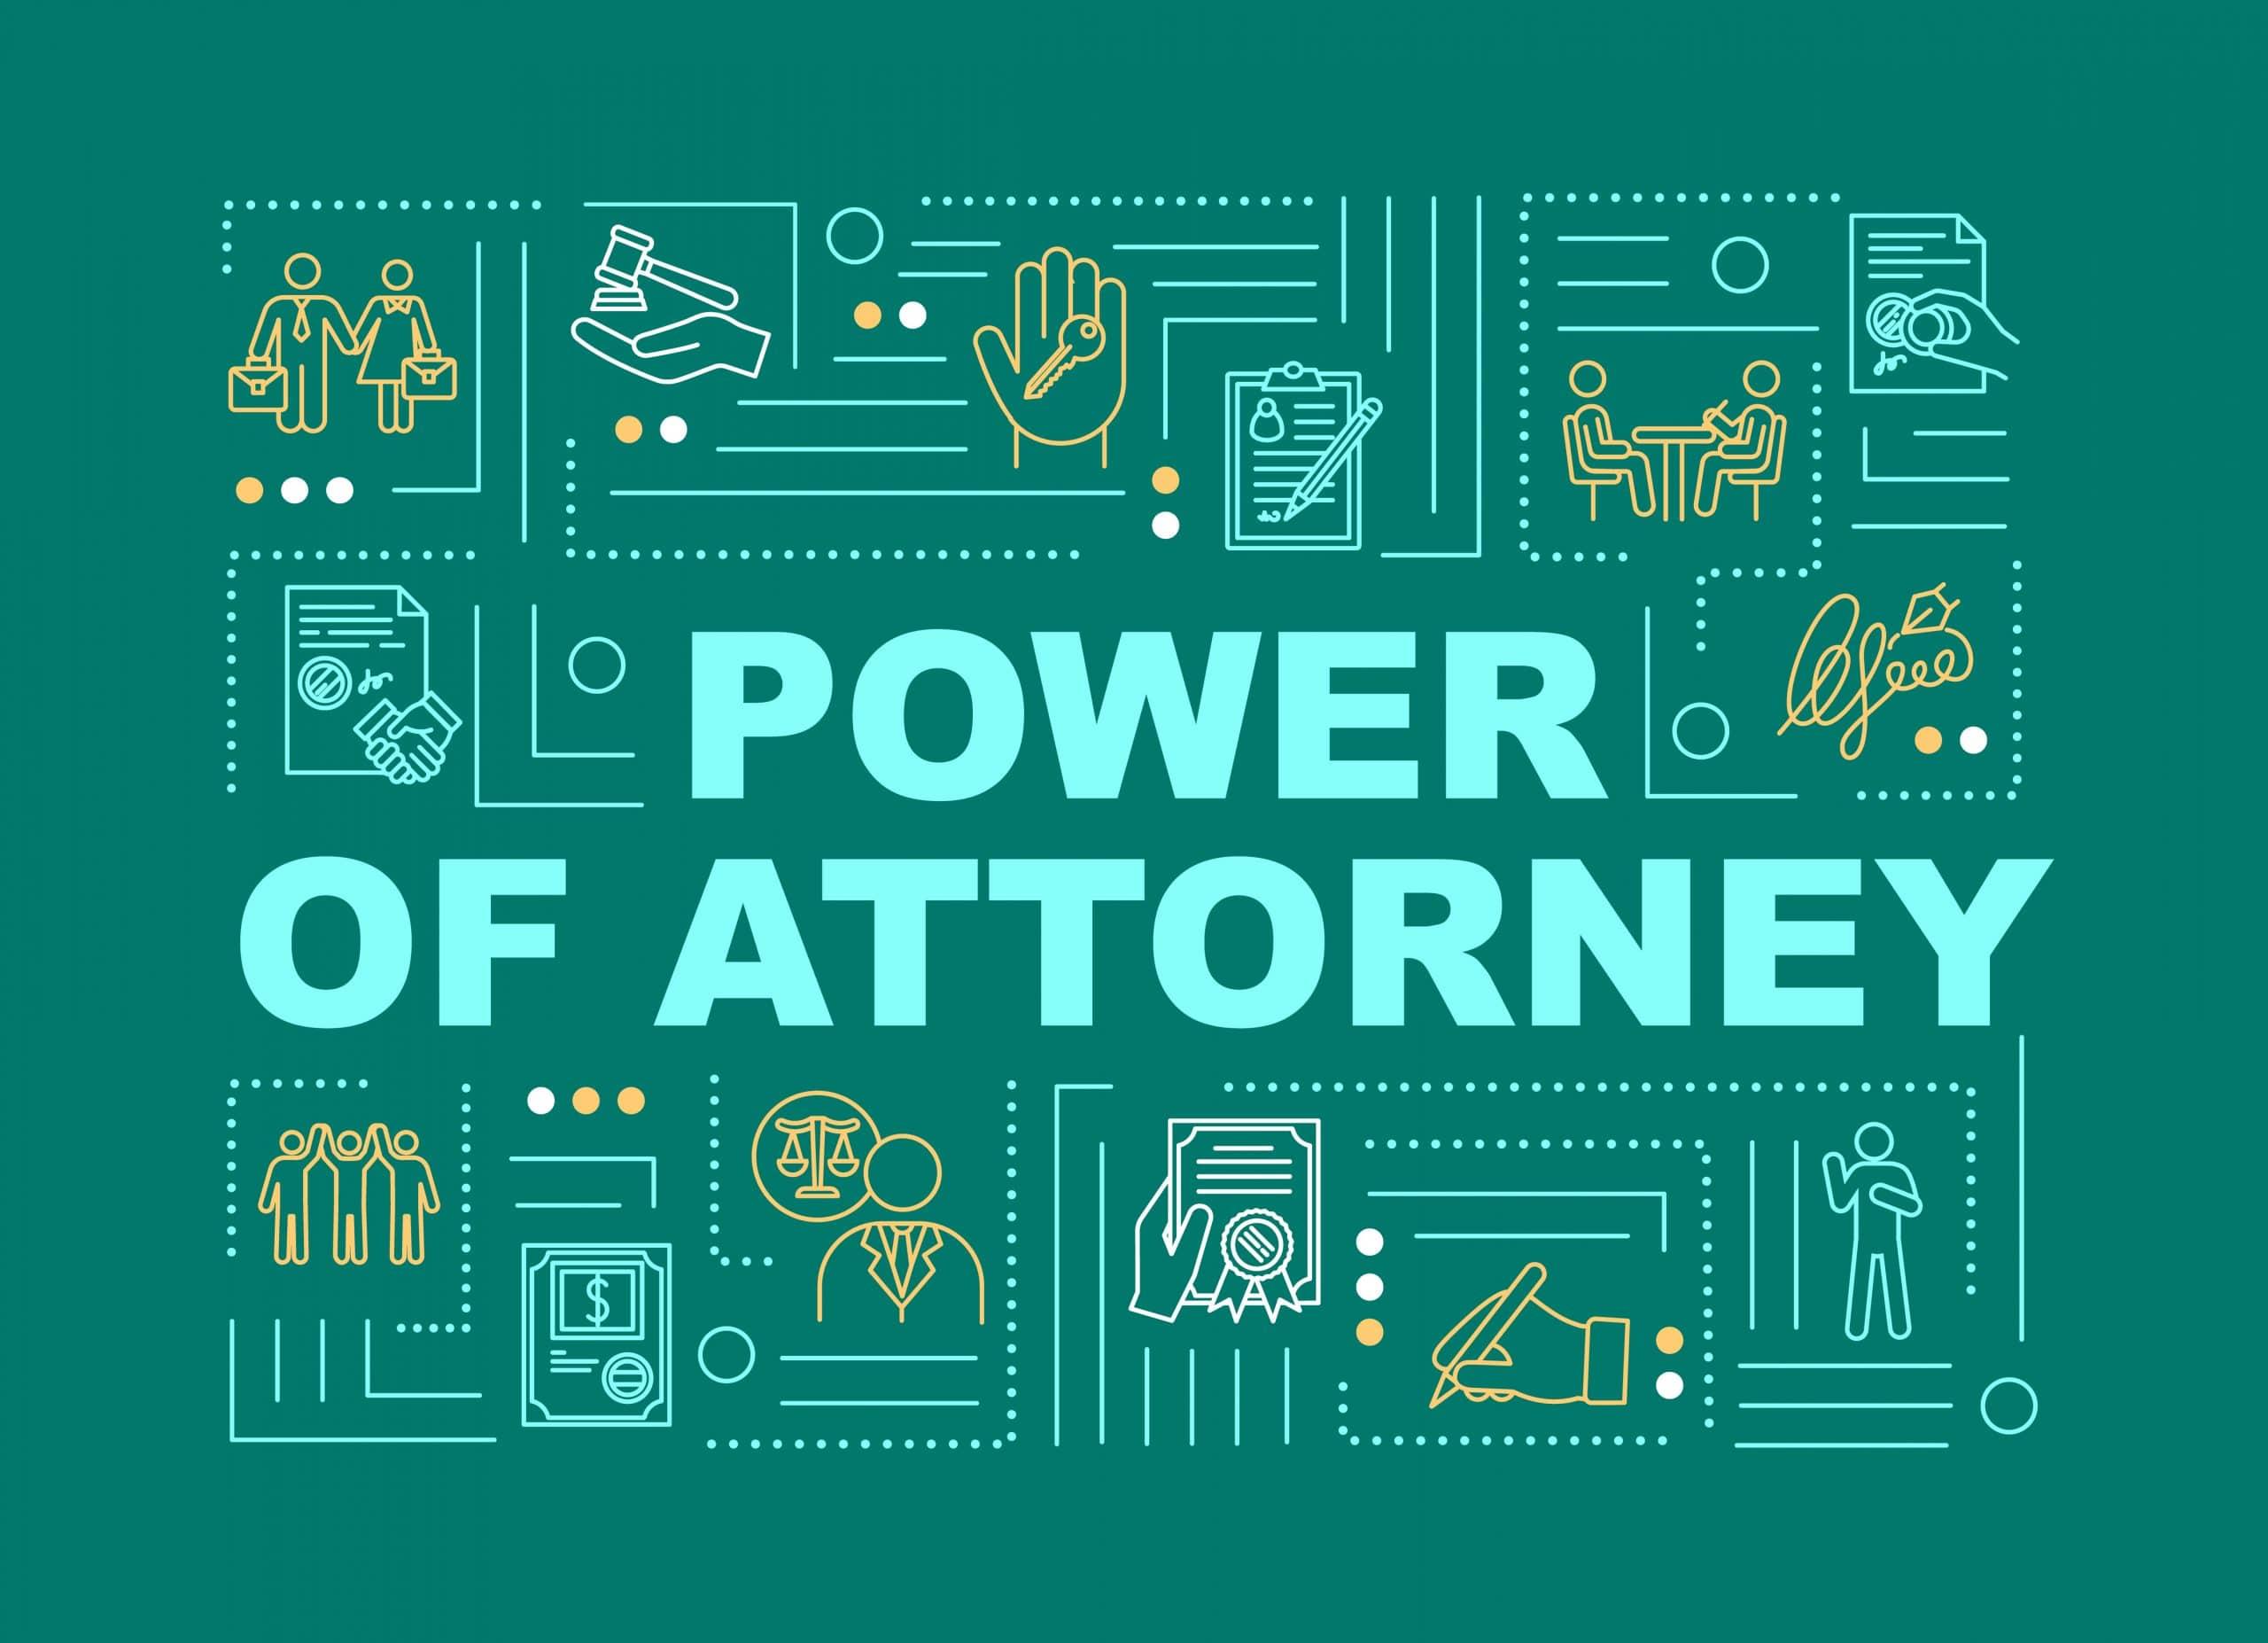 New York Power of Attorney